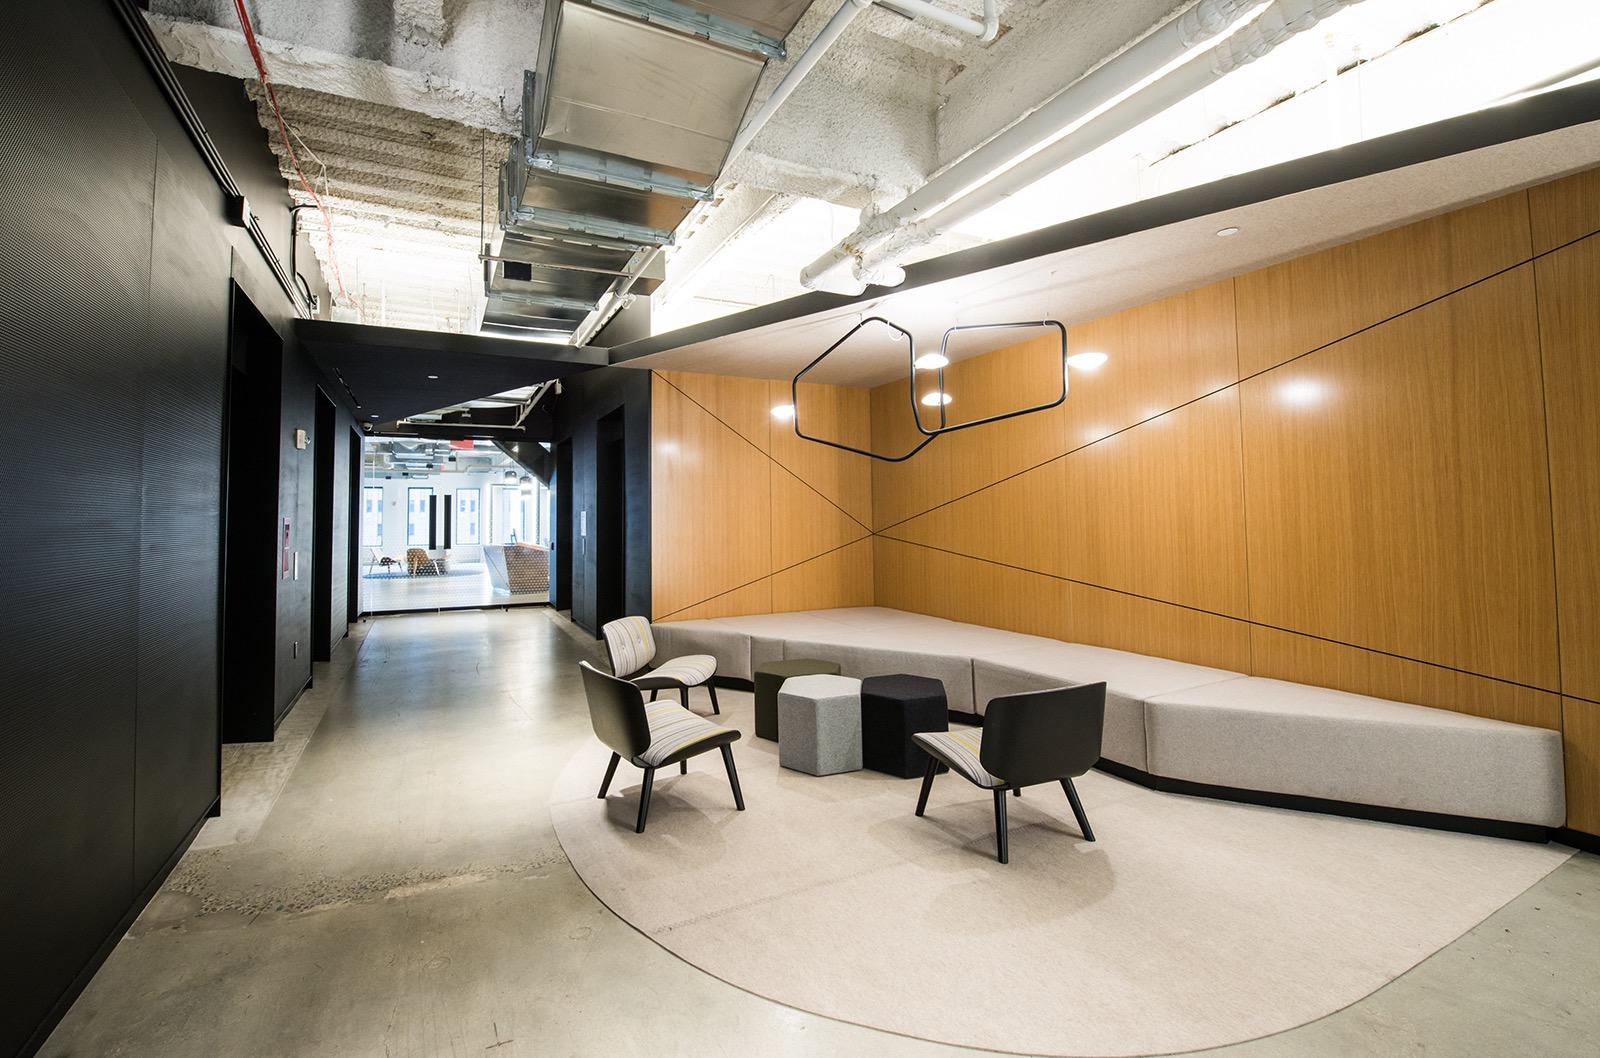 vox-media-nyc-office-14